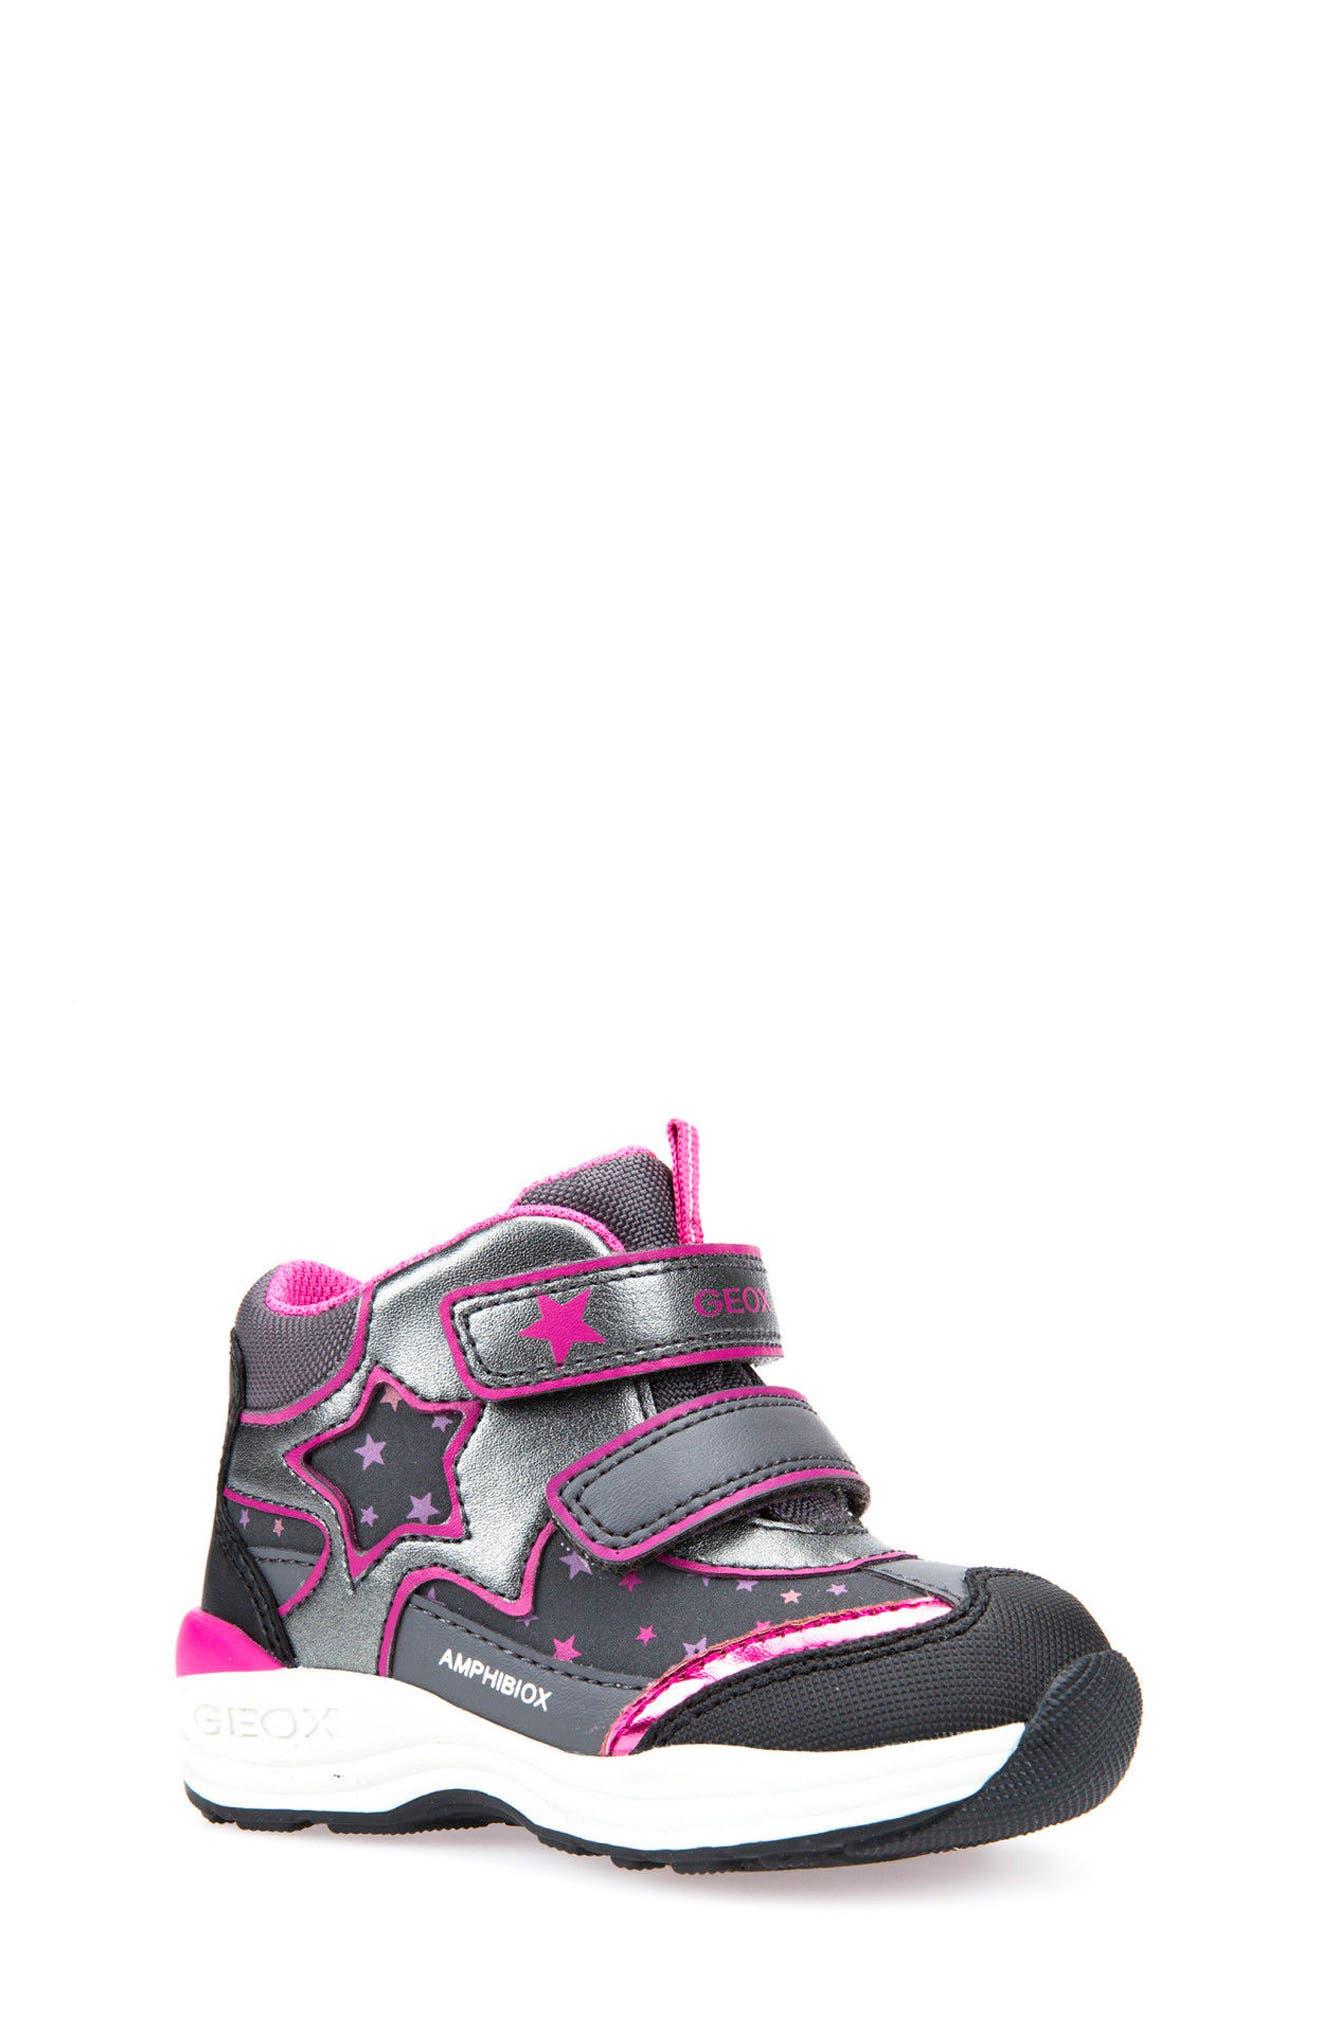 Main Image - Geox Gulp ABX Waterproof Star Sneaker Boot (Walker & Toddler)